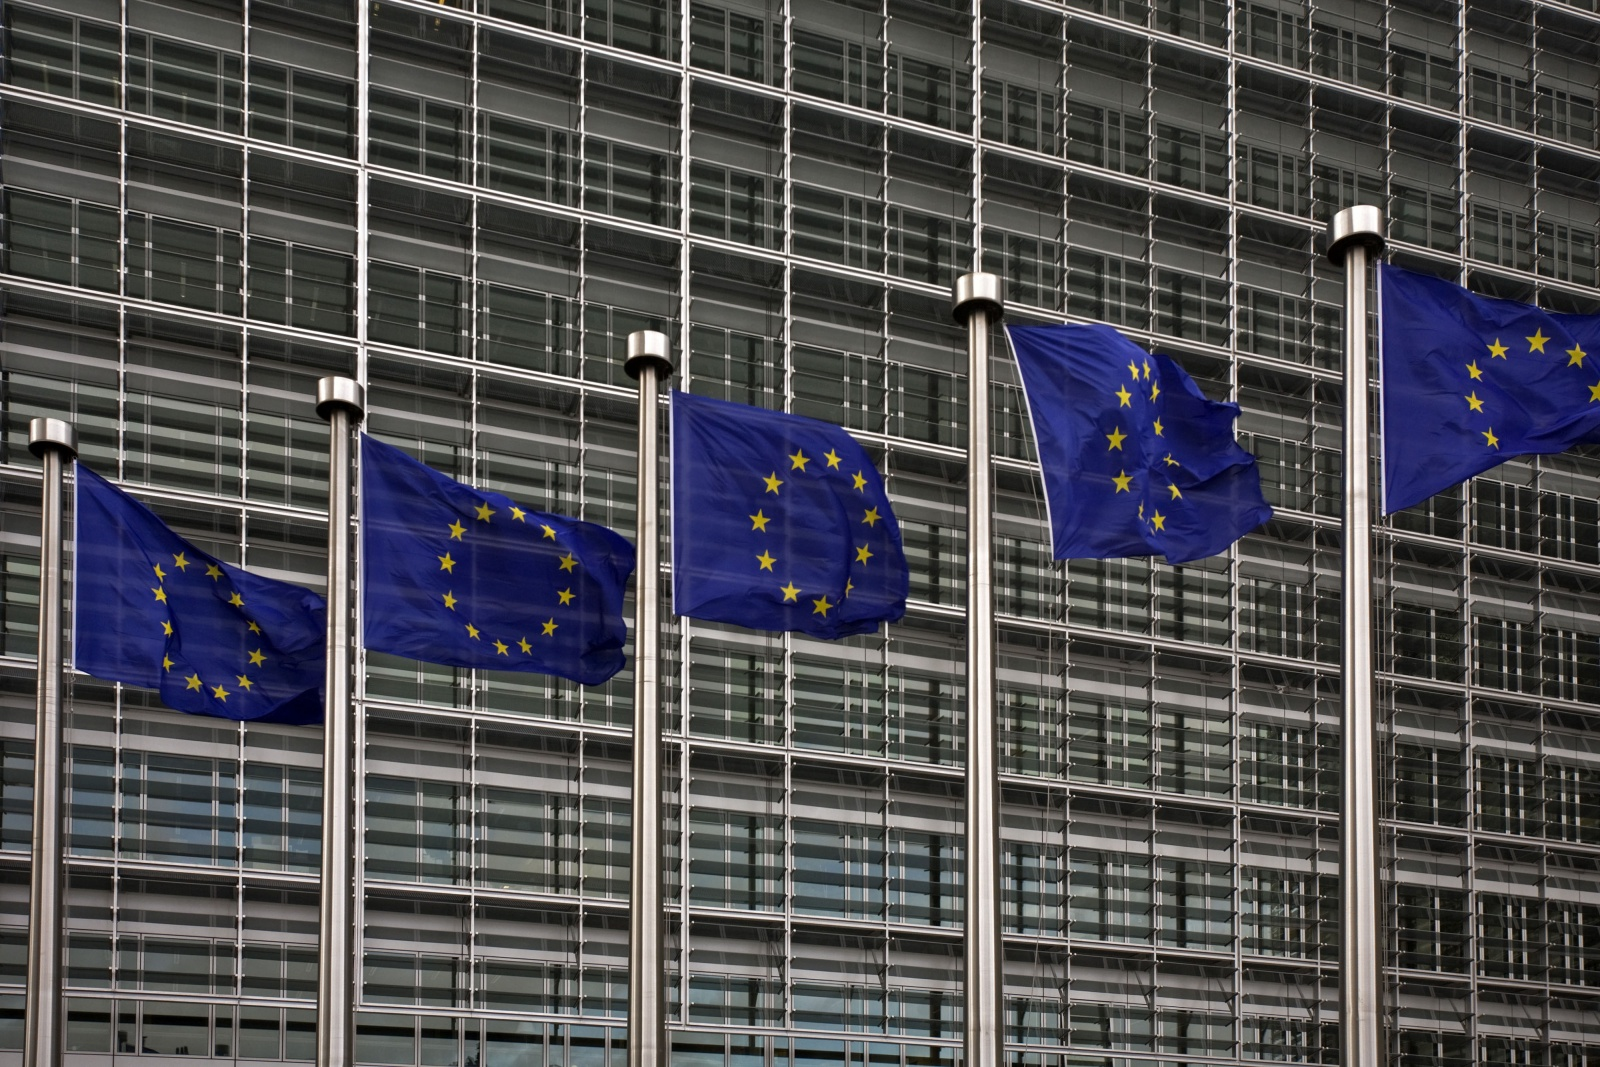 Belgio - Bruxelles, Commissioni Europea, Commission Europeenne - Schuman buiding